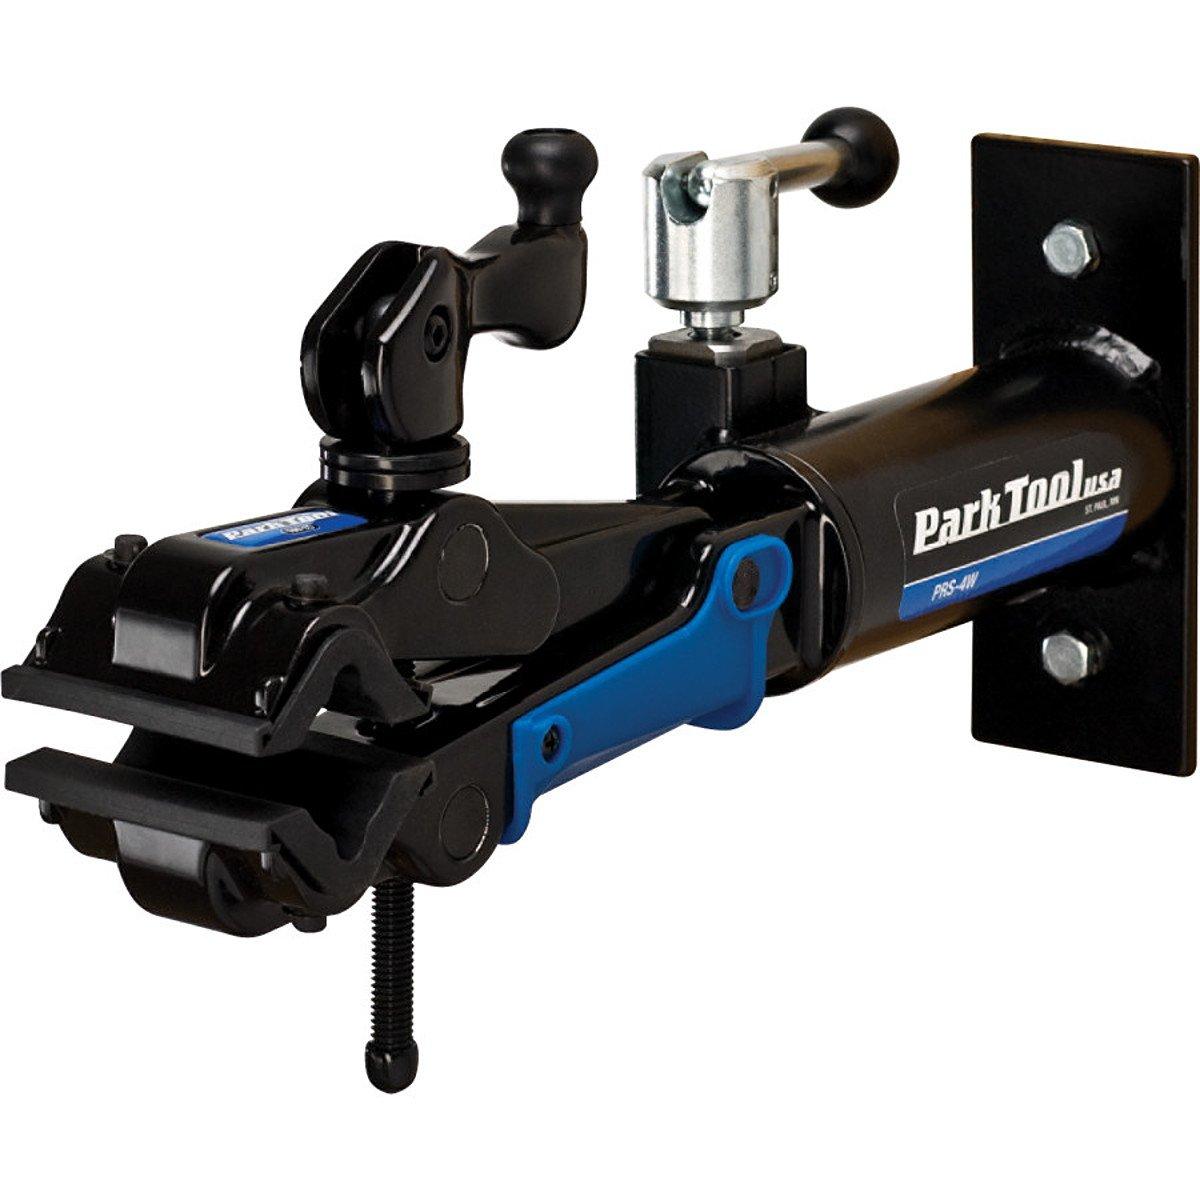 Park Tool bike repair stand PRS-4W-2 repair stand with clamp100-3D